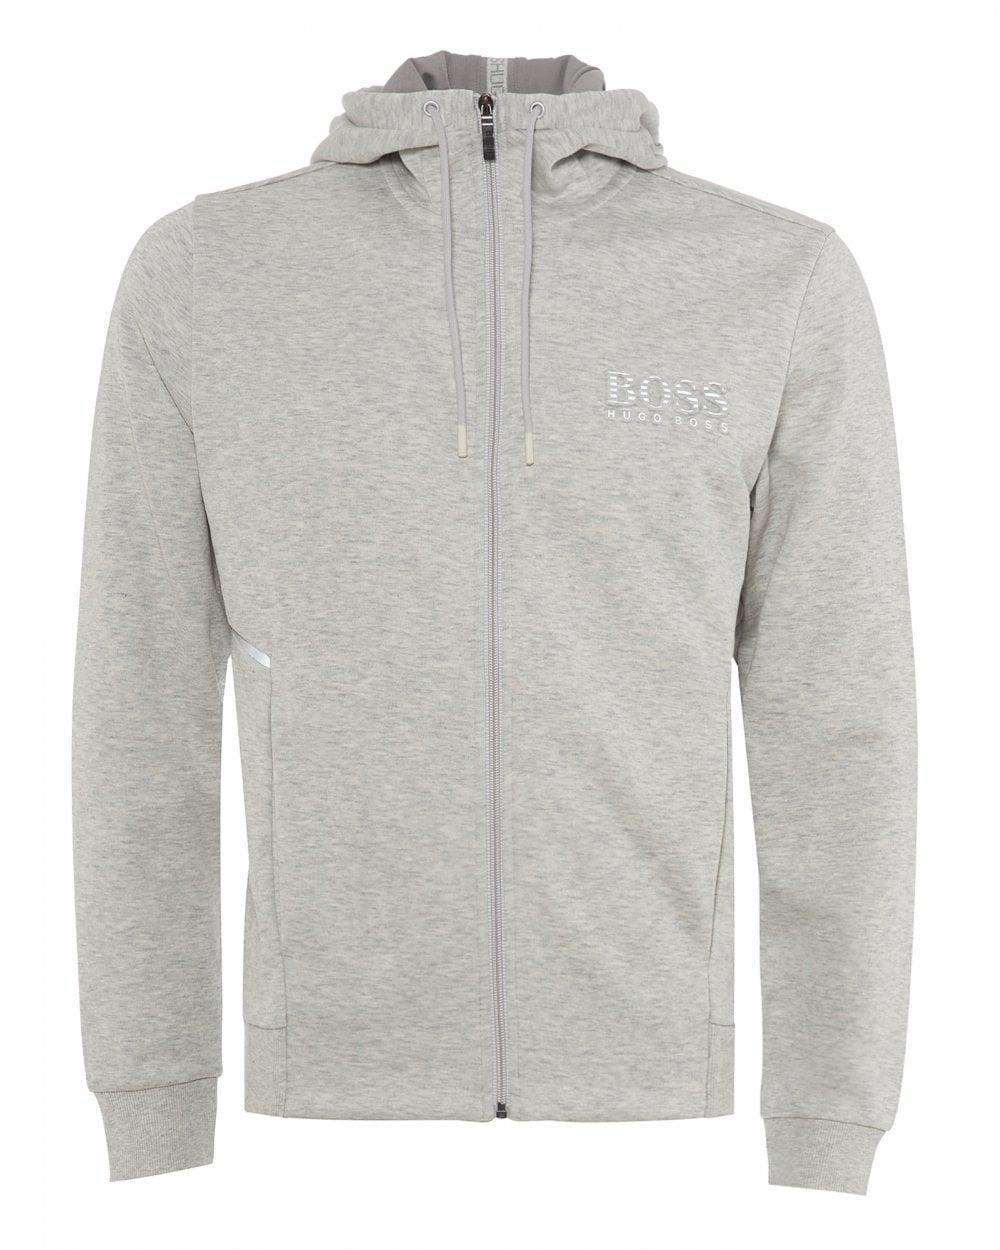 91b7b64f1 BOSS - Gray Saggy Hooded Sweatshirt, Striped Logo Hoodie for Men - Lyst.  View fullscreen